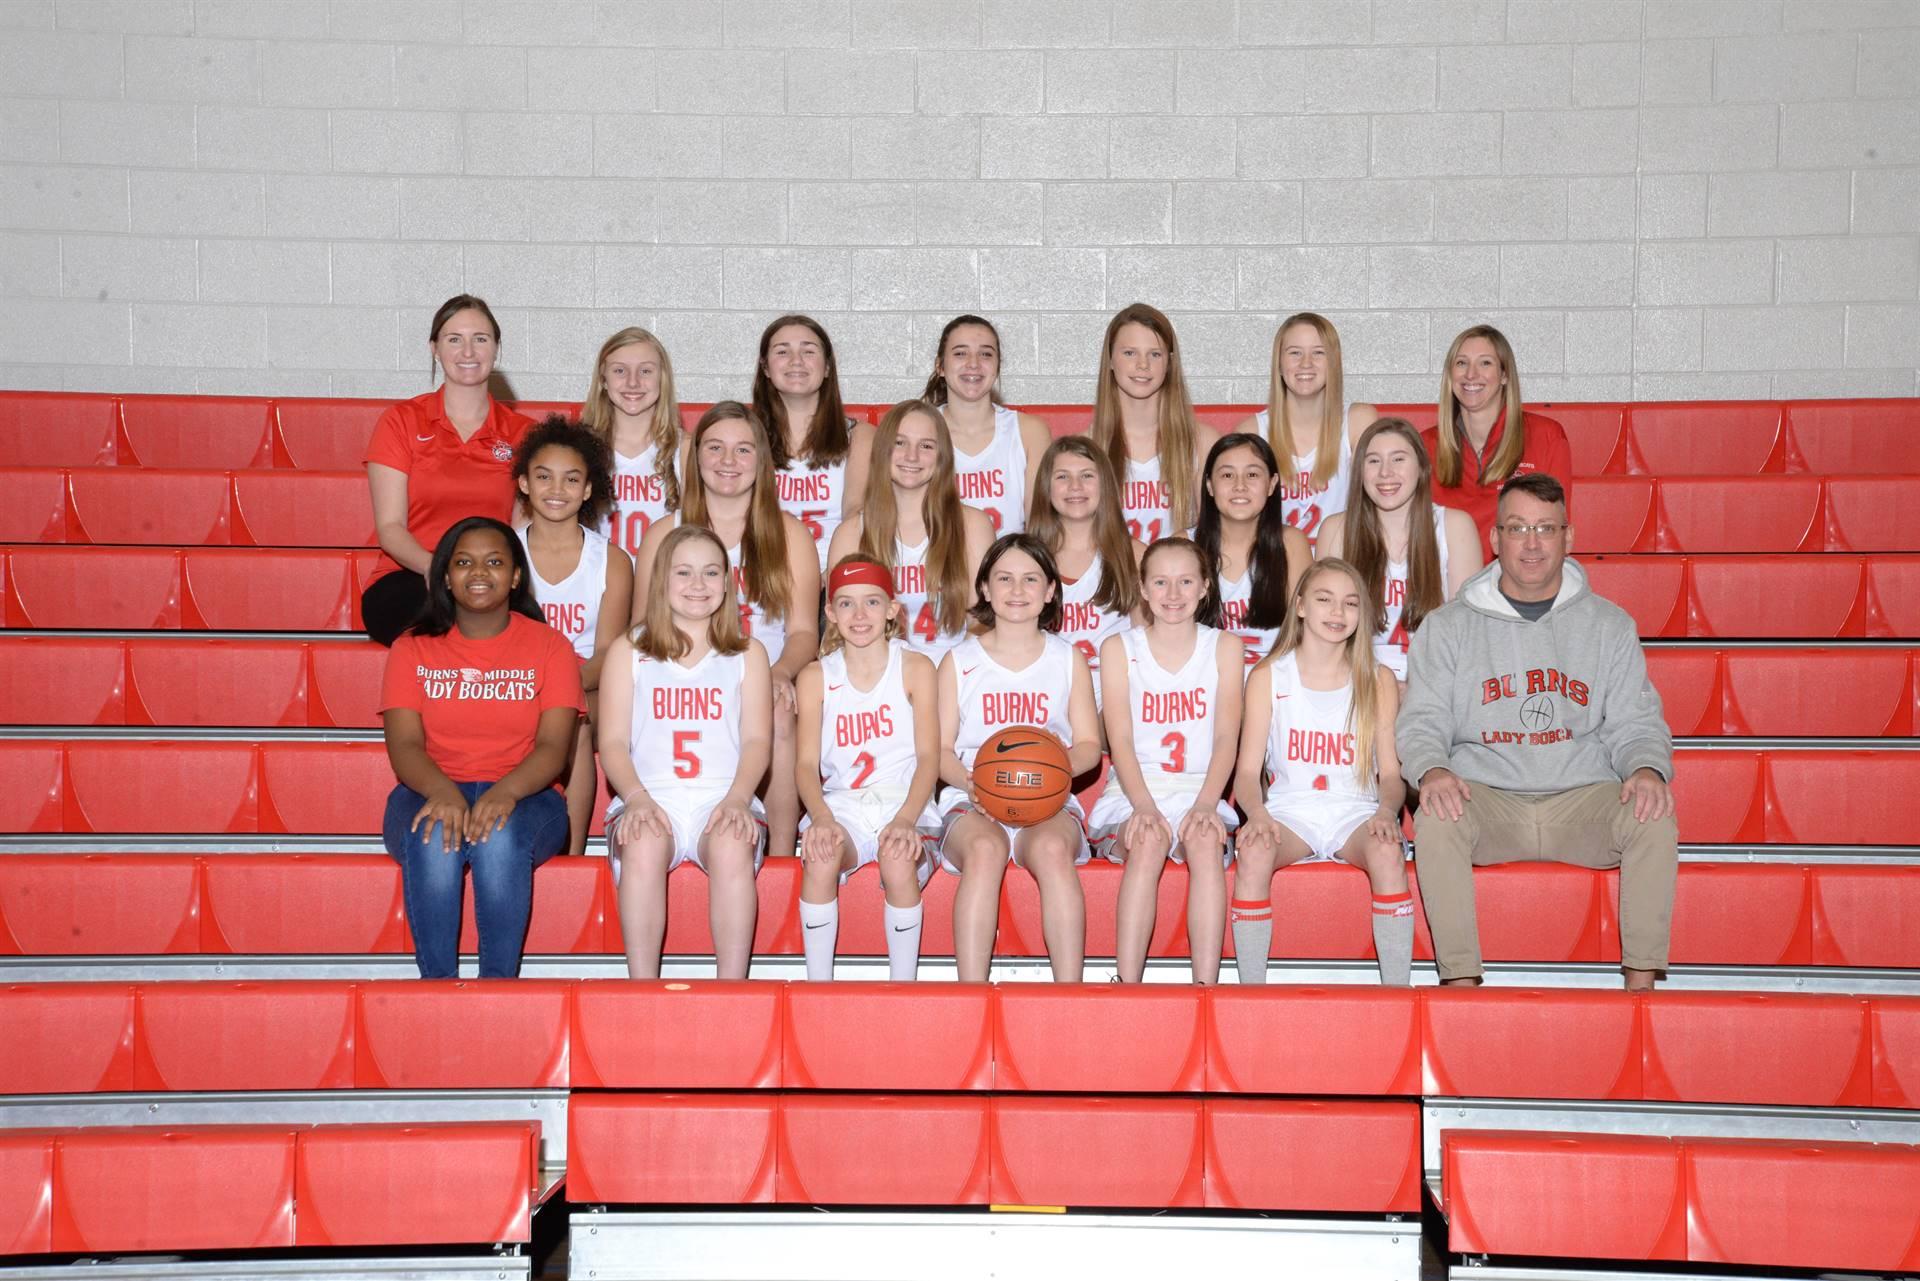 20-21 Lady Bobcats Basketball Team